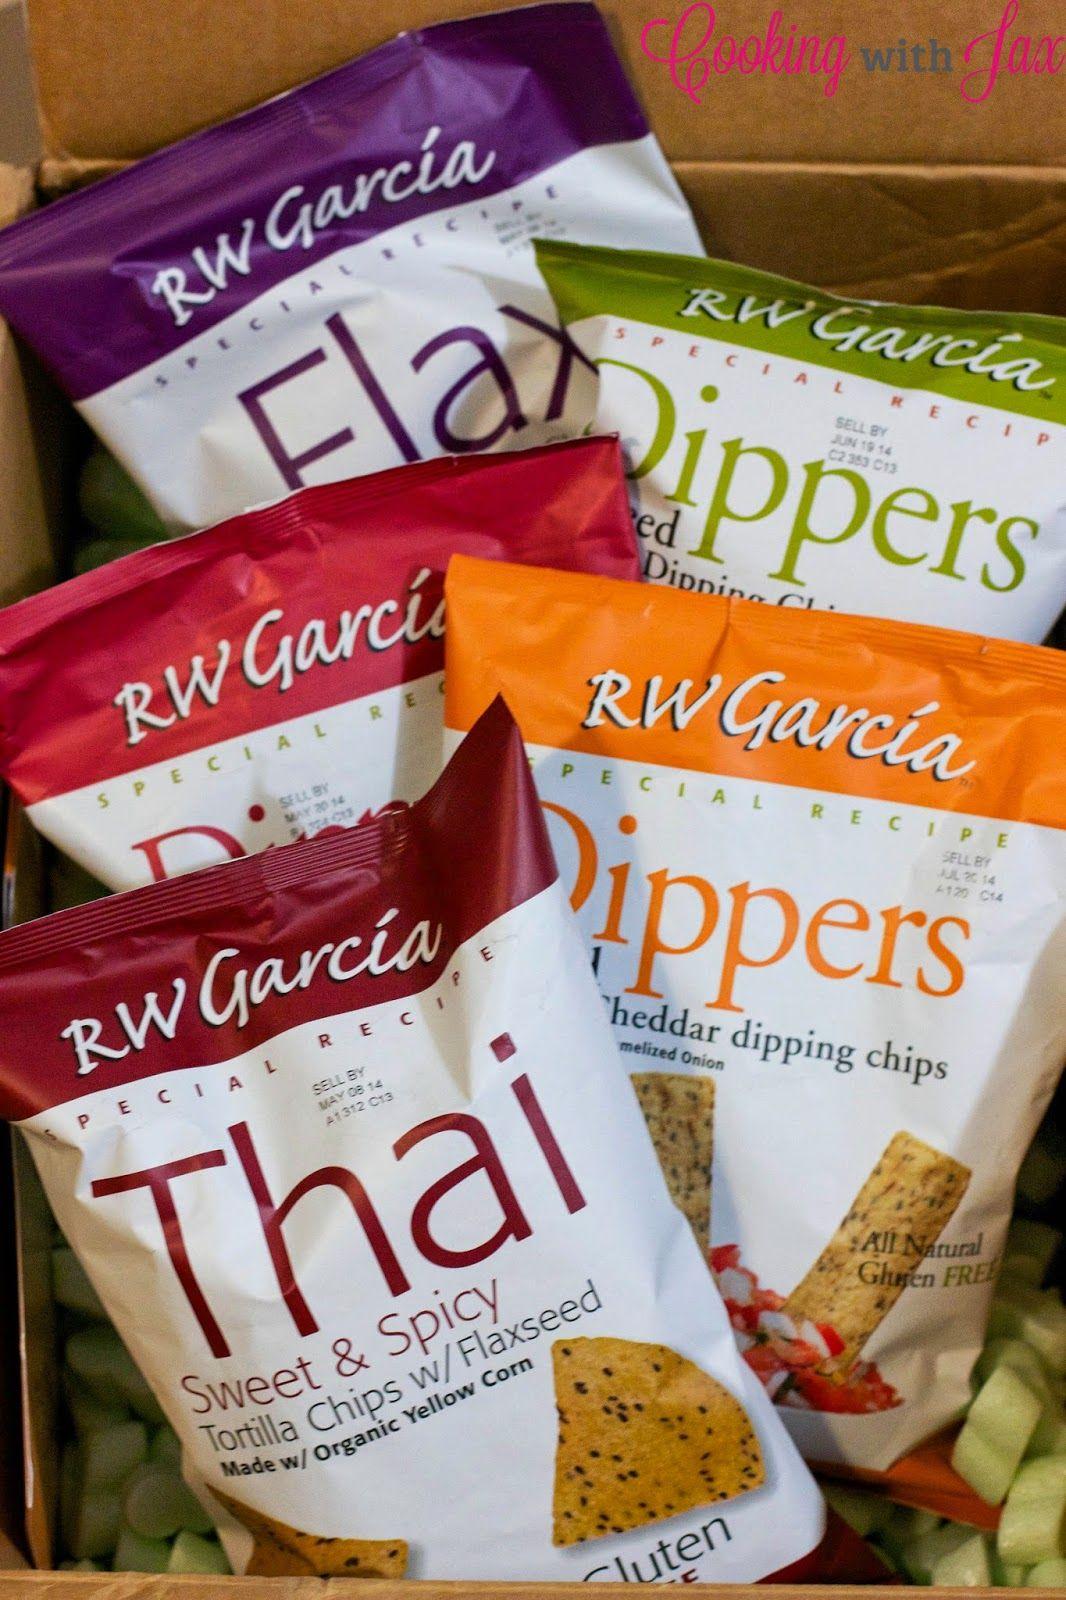 RW Garcia Gluten Free Tortilla Chips Review + Giveaway